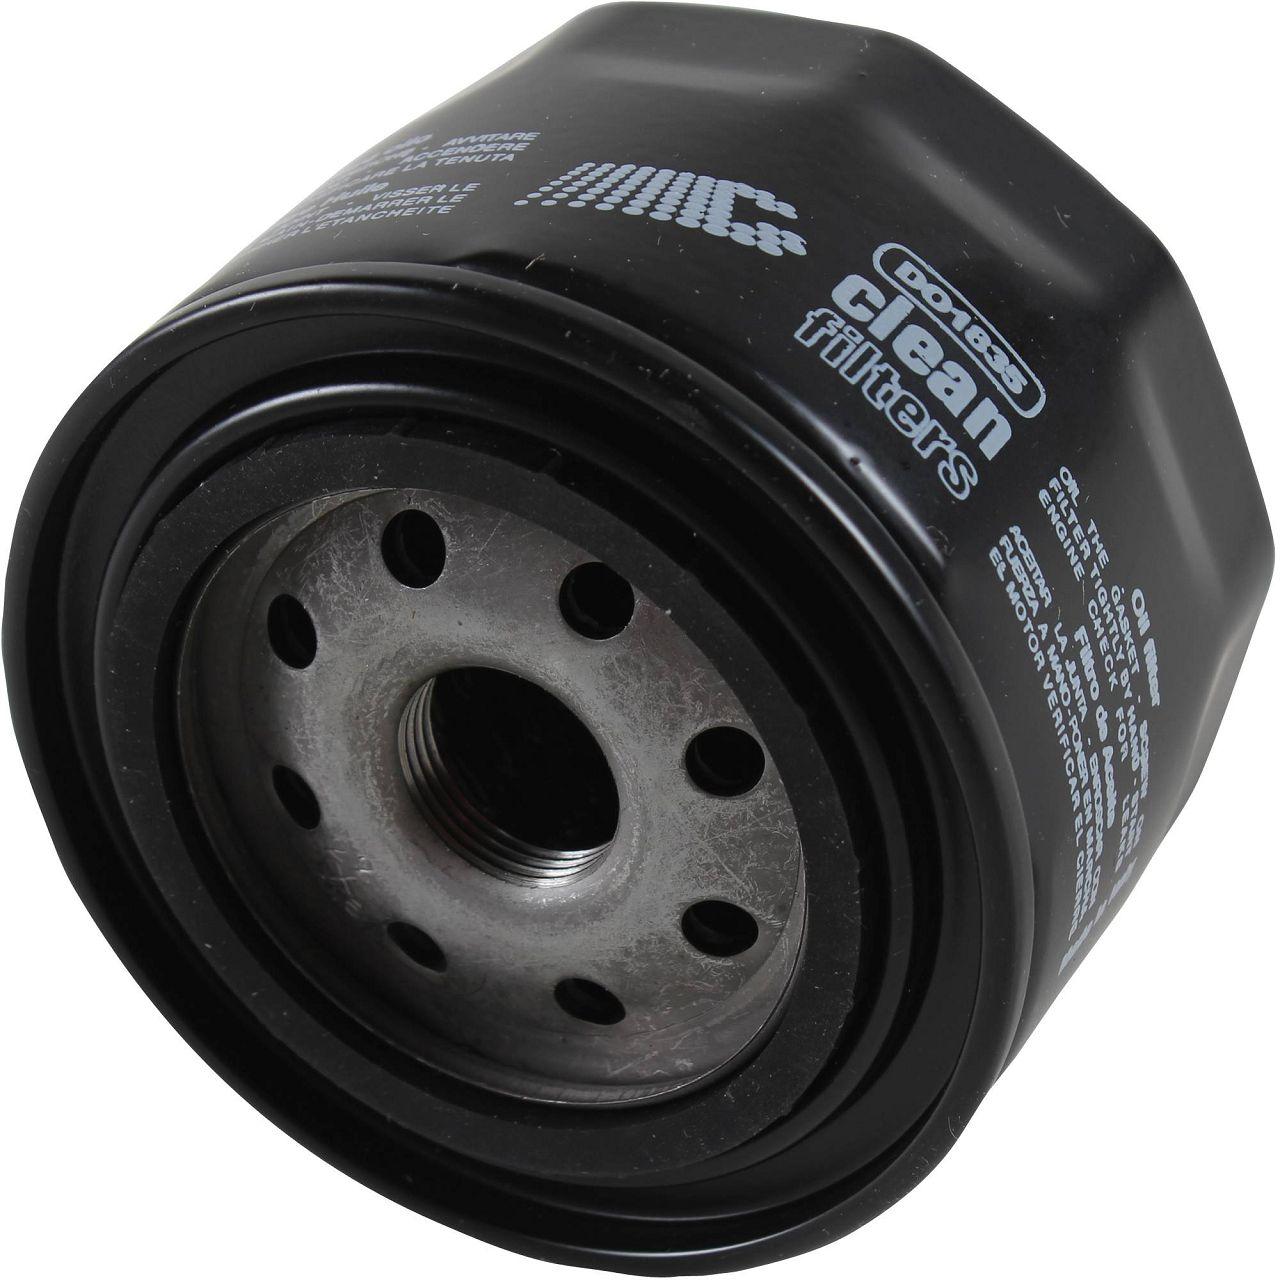 Ölfilter Motorölfilter für Fiat Ducato (244 250) 2,3D Diesel 8094872 / 504091563